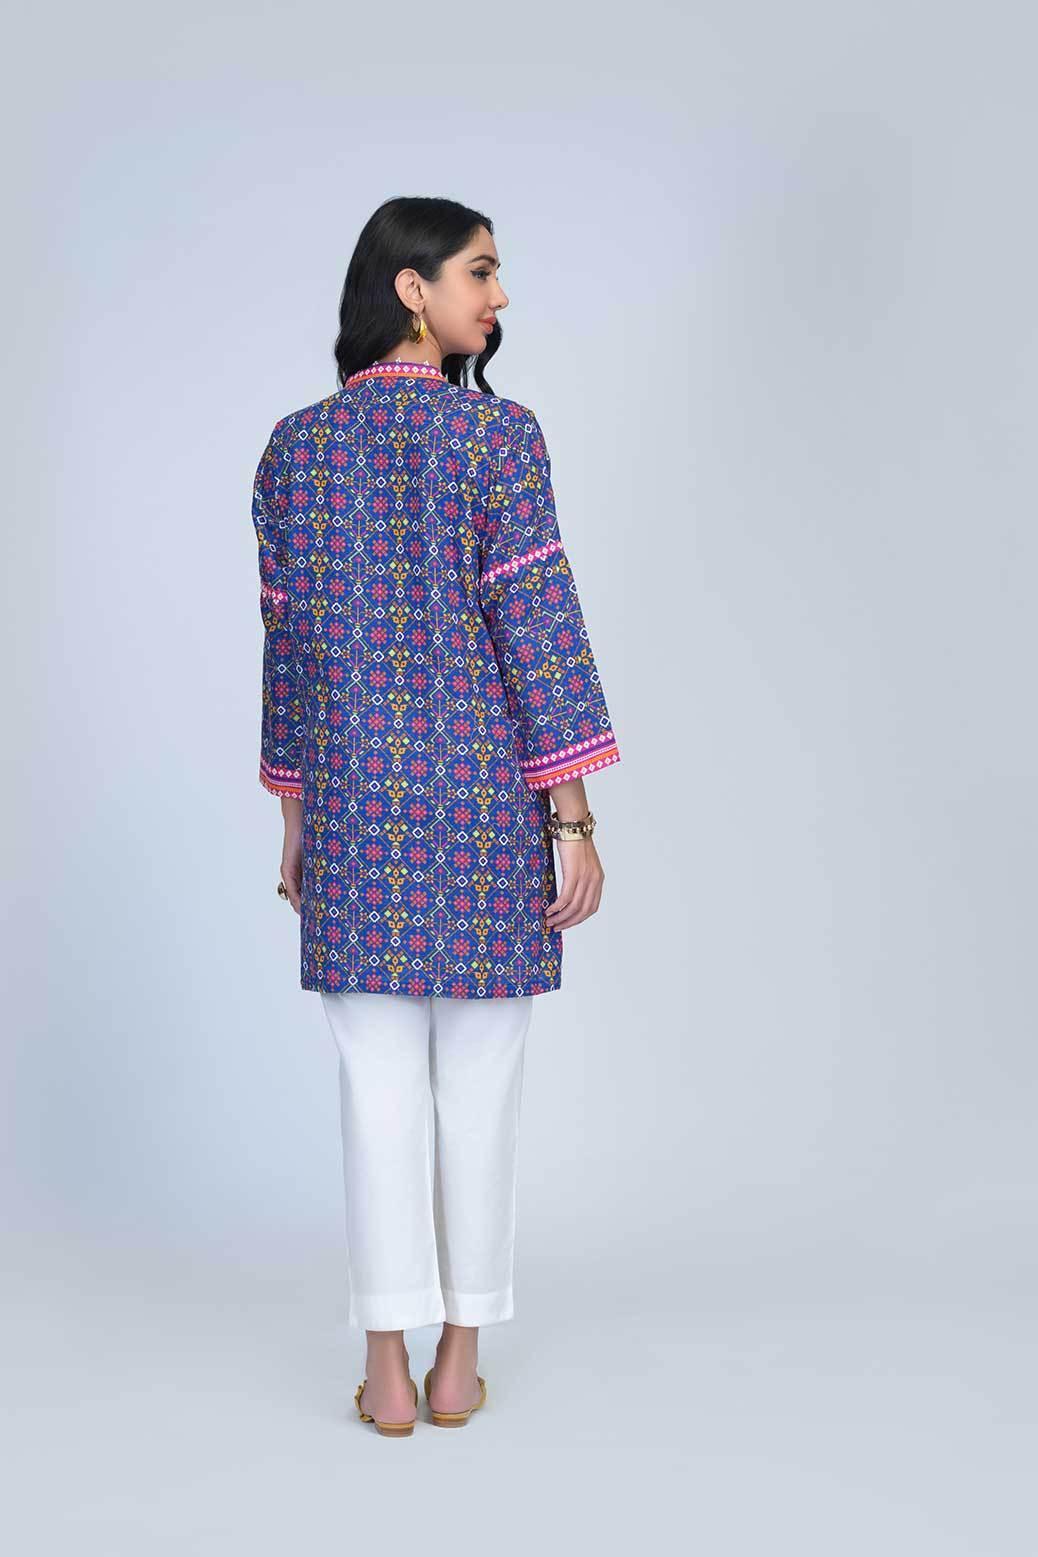 Bonanza Satrangi Ready to War Blue color dress Back-side pose